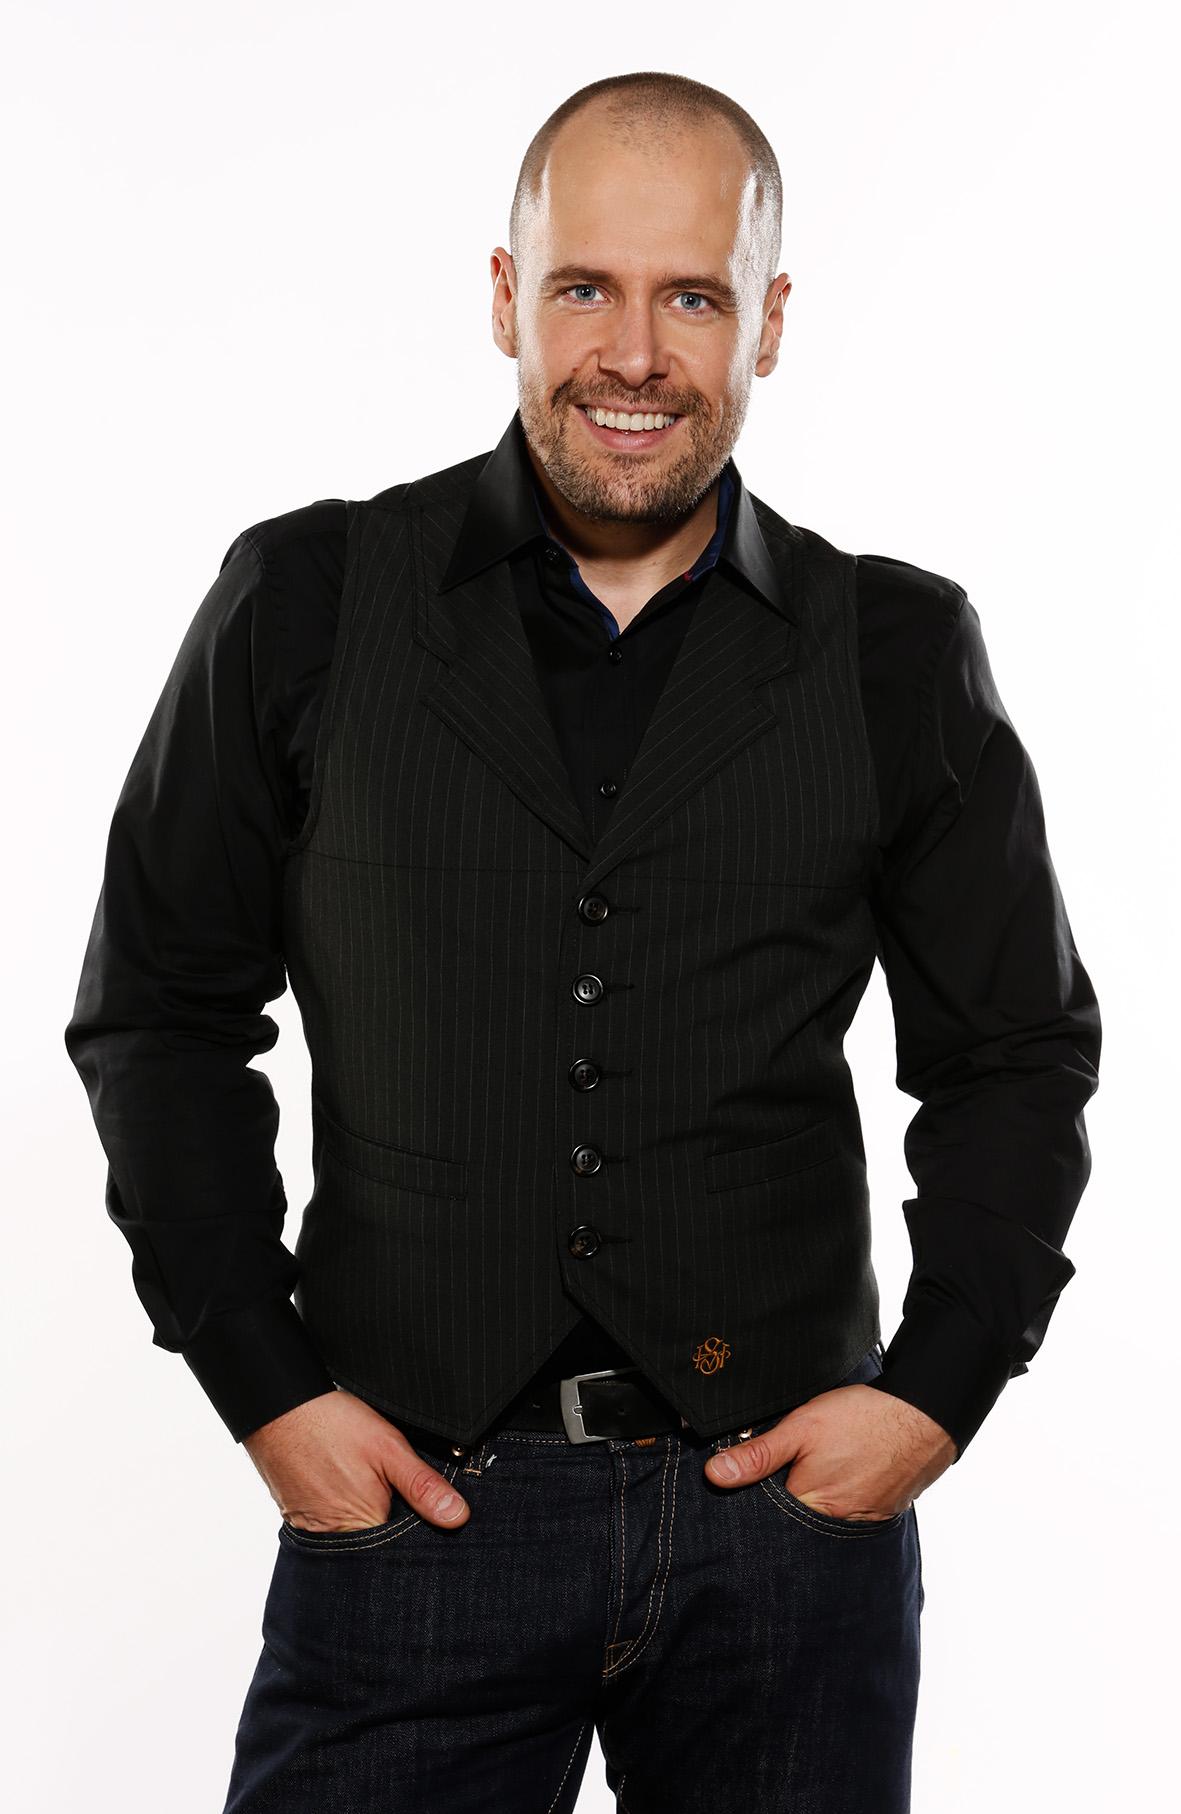 SebastianMauritz